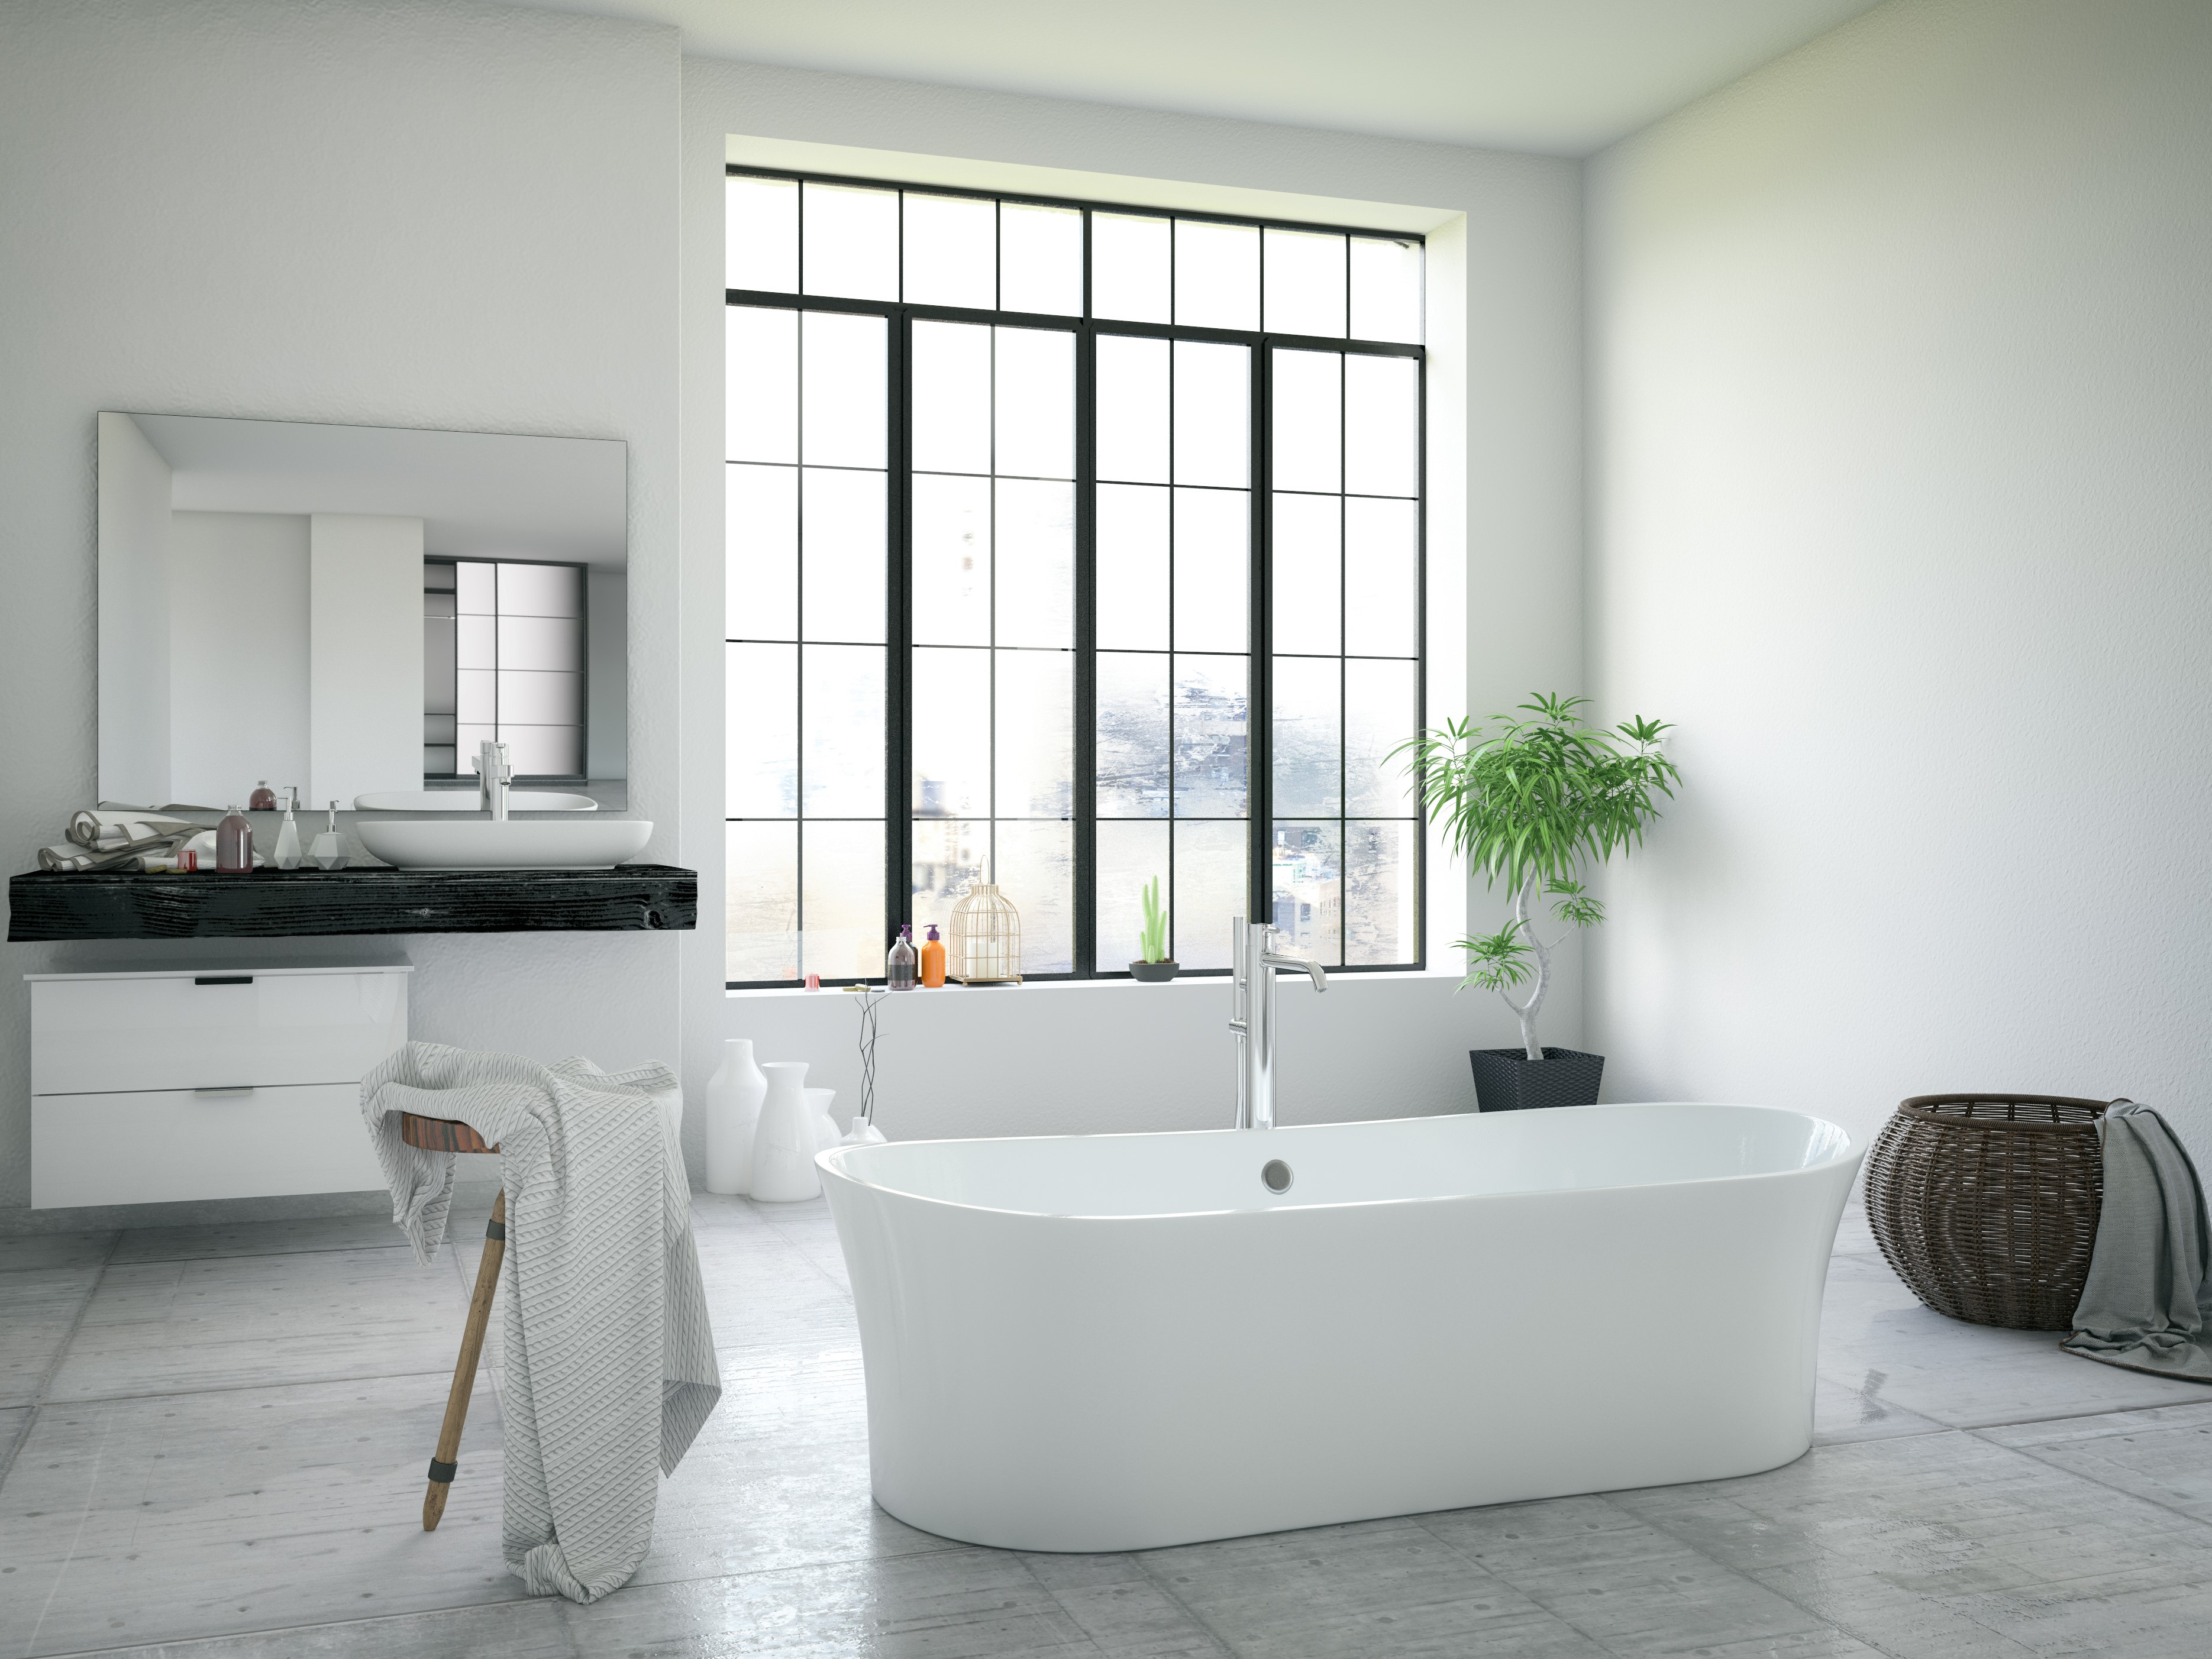 Bath-iStock-866104130ed